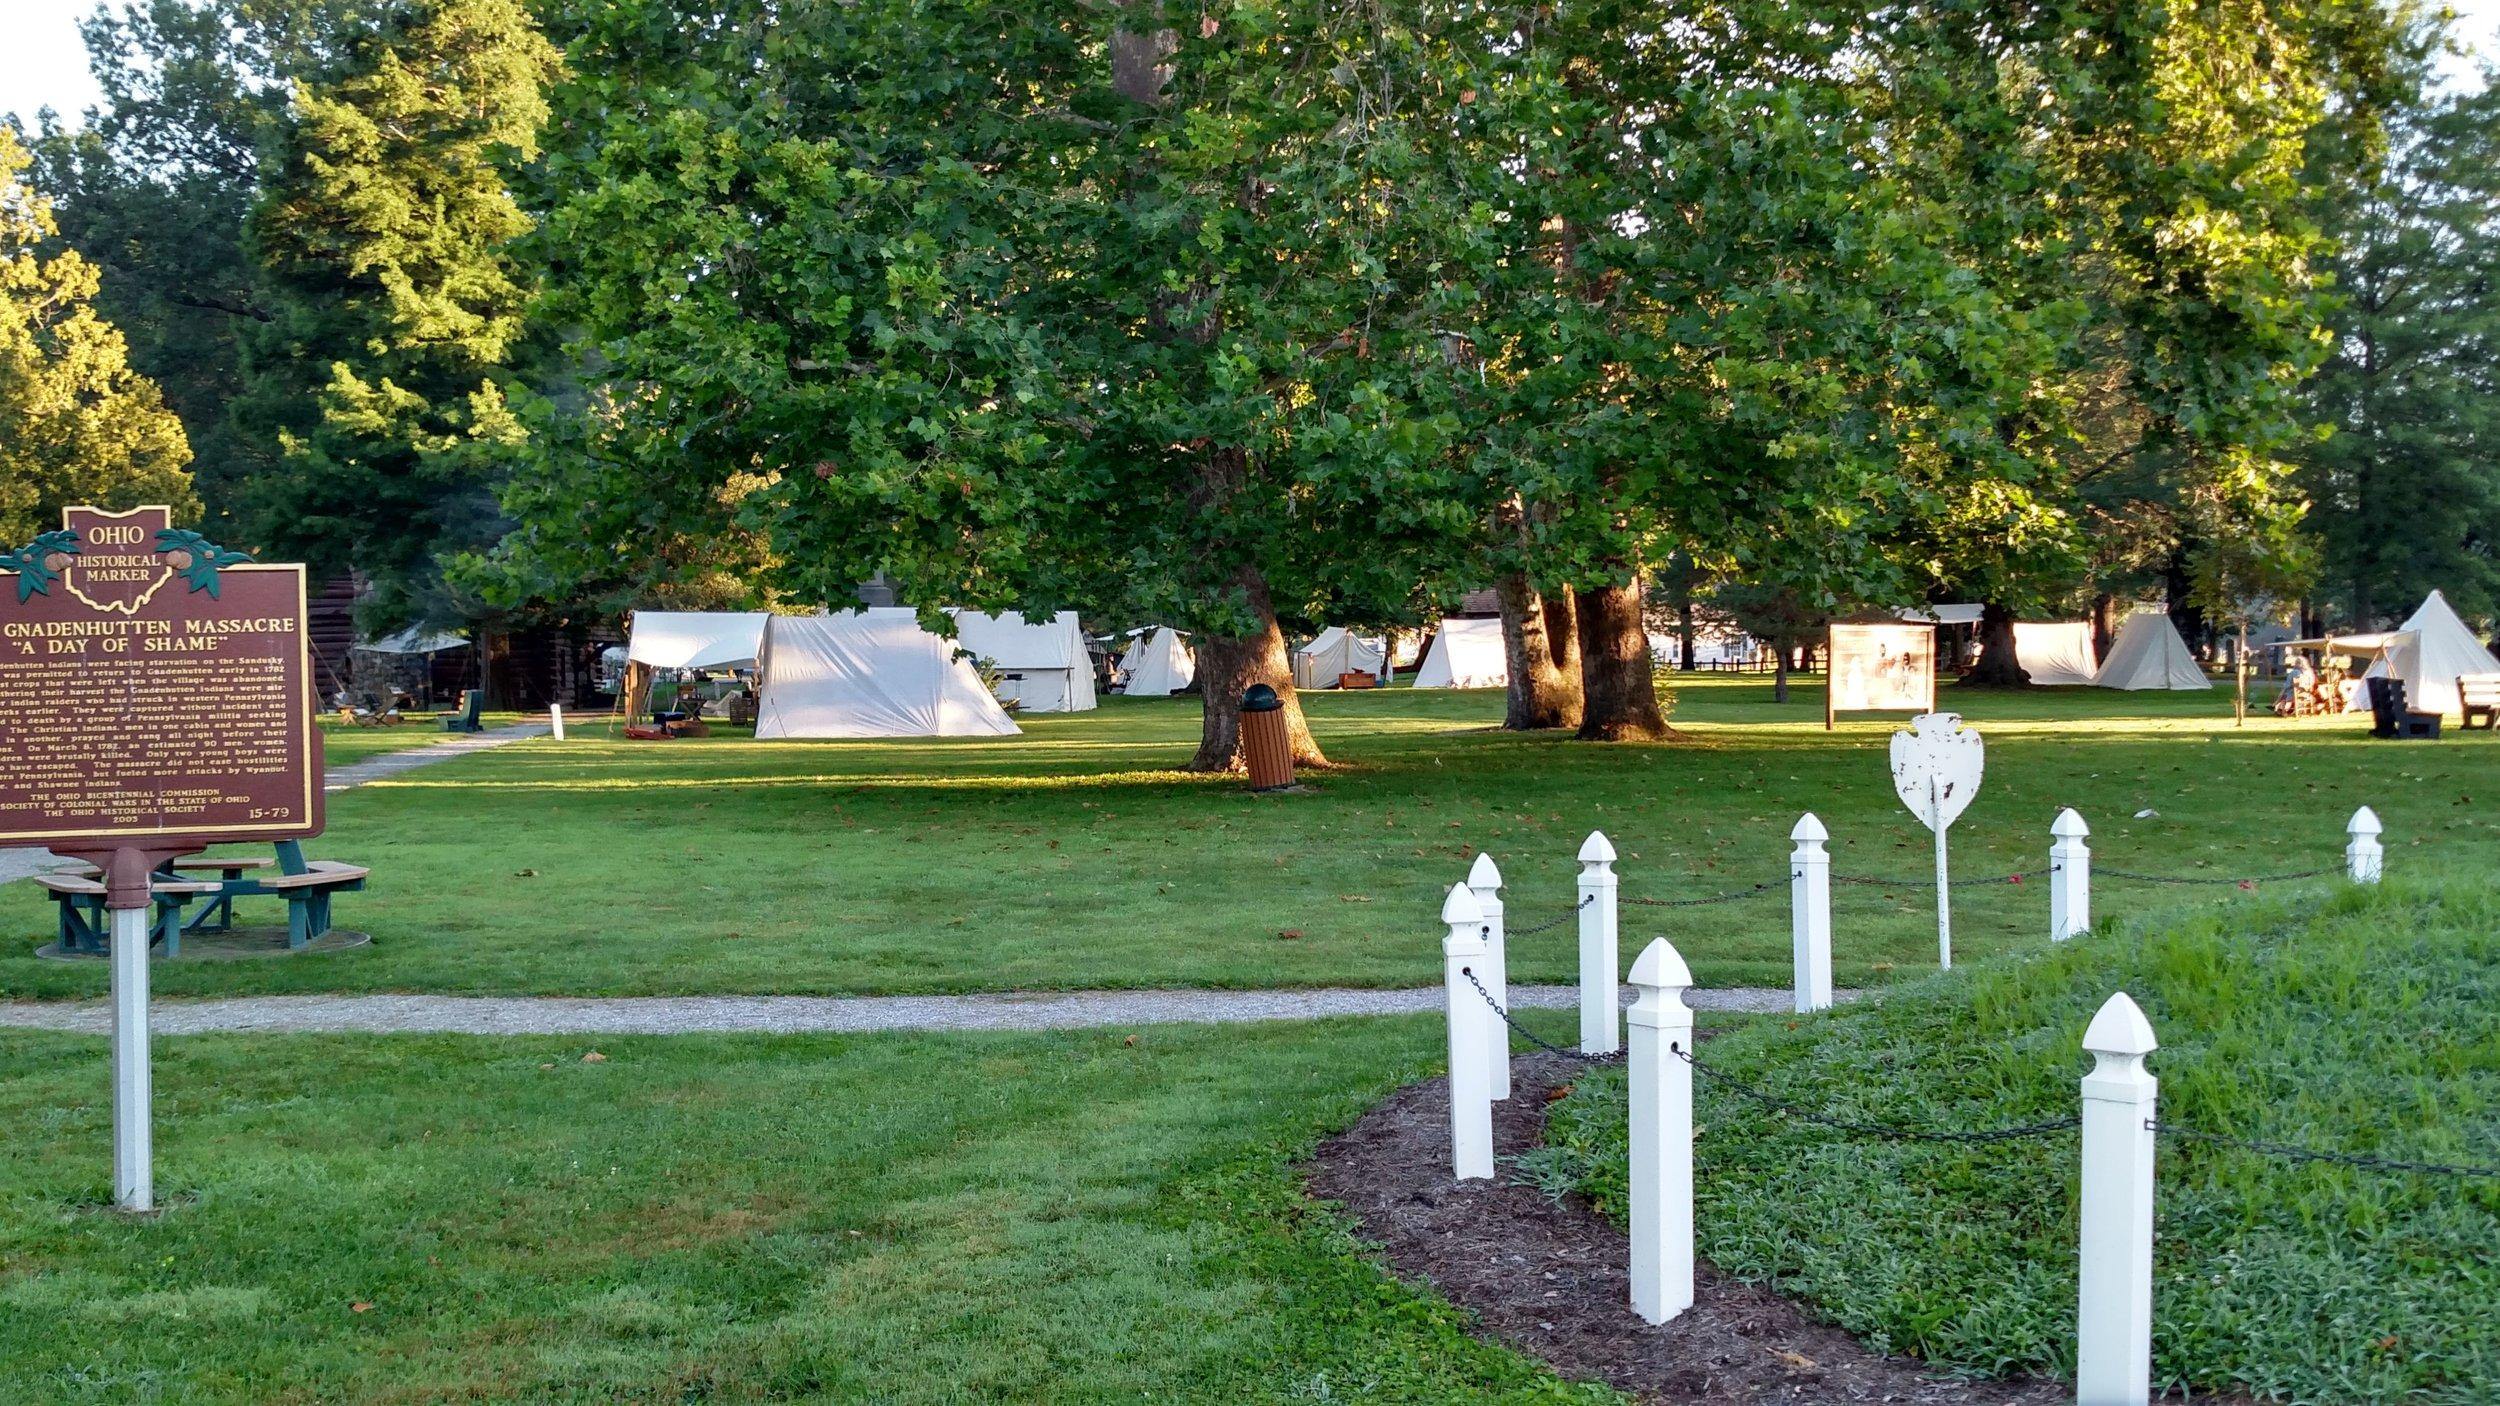 Pioneer Days primitive encampment at Gnadenhutten Museum & Historical Park